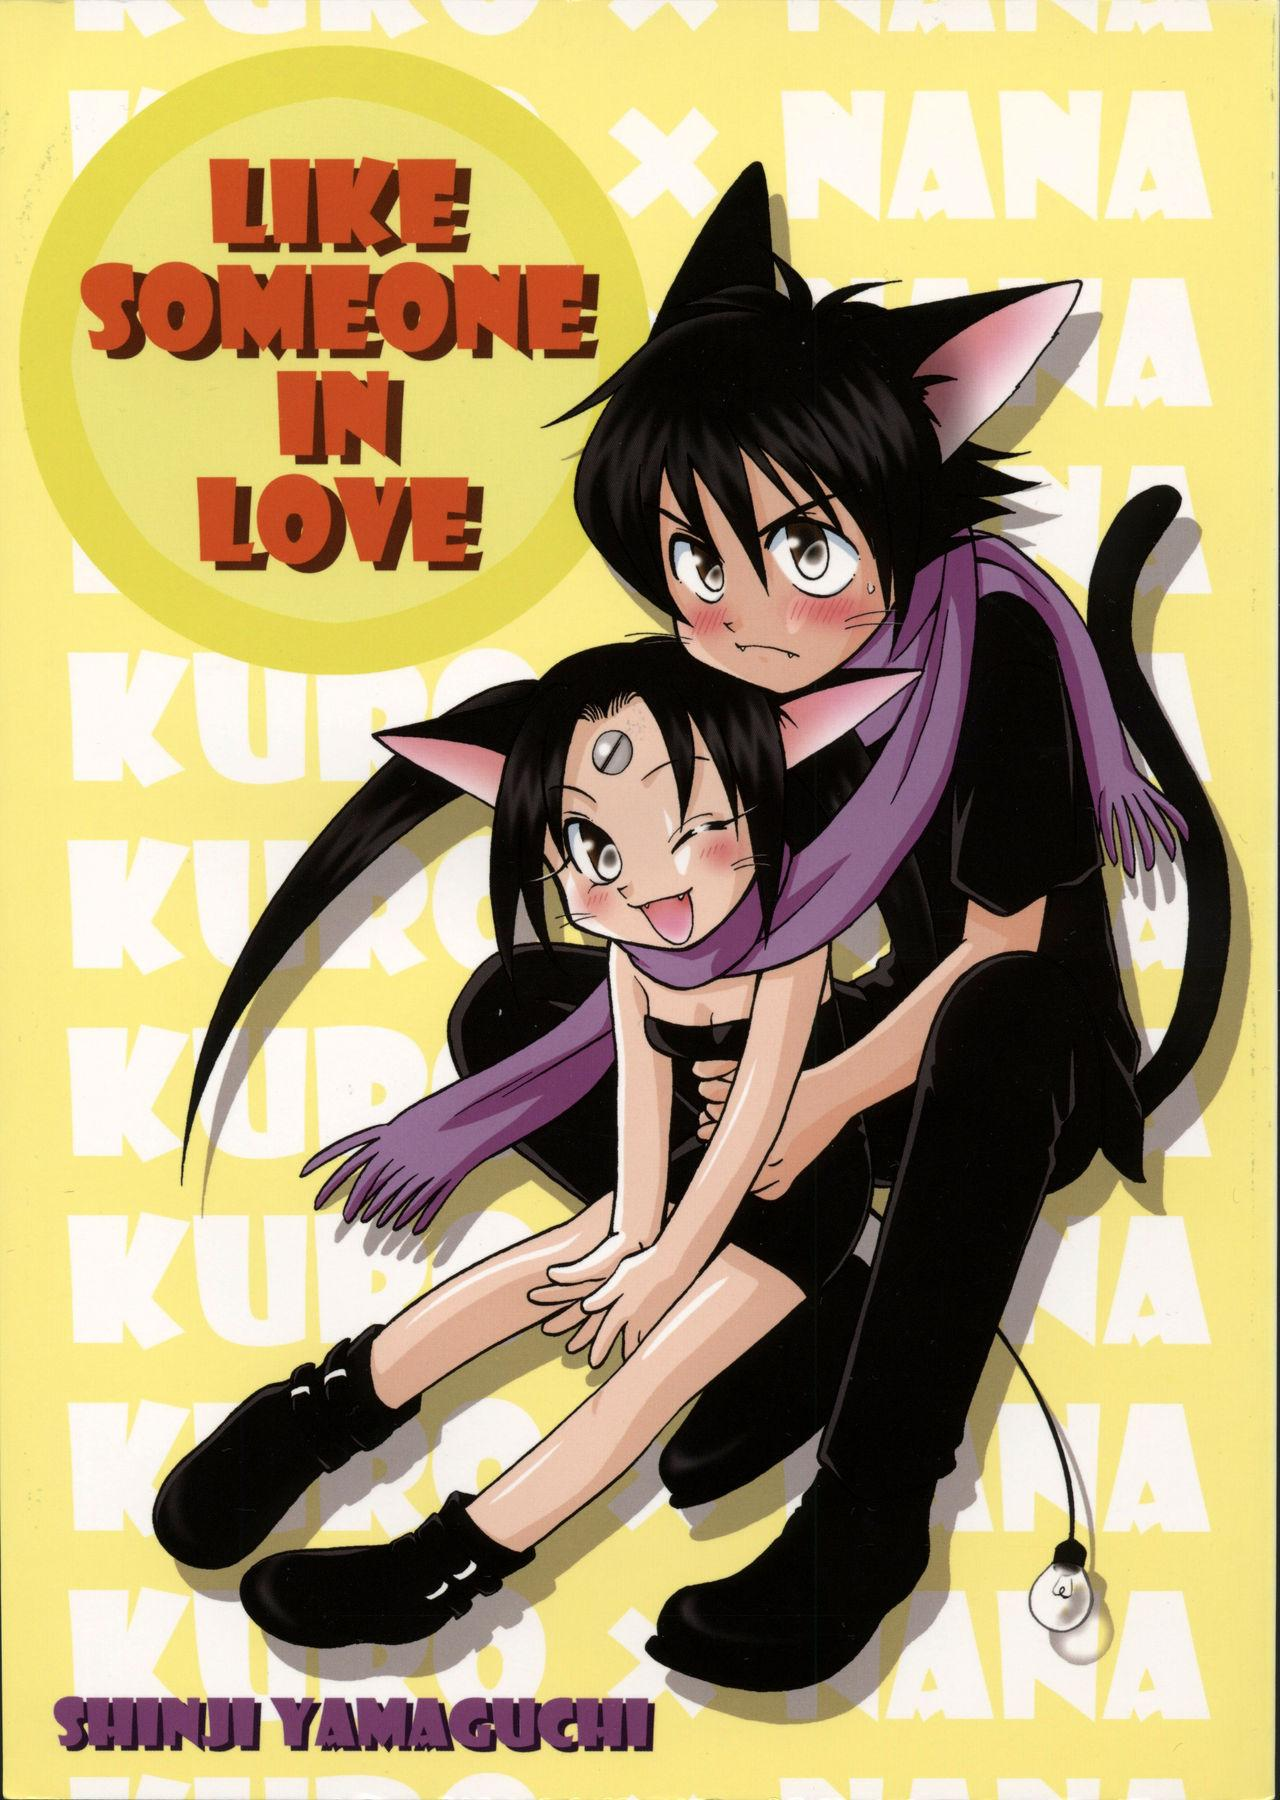 LIKE SOMEONE IN LOVE 0